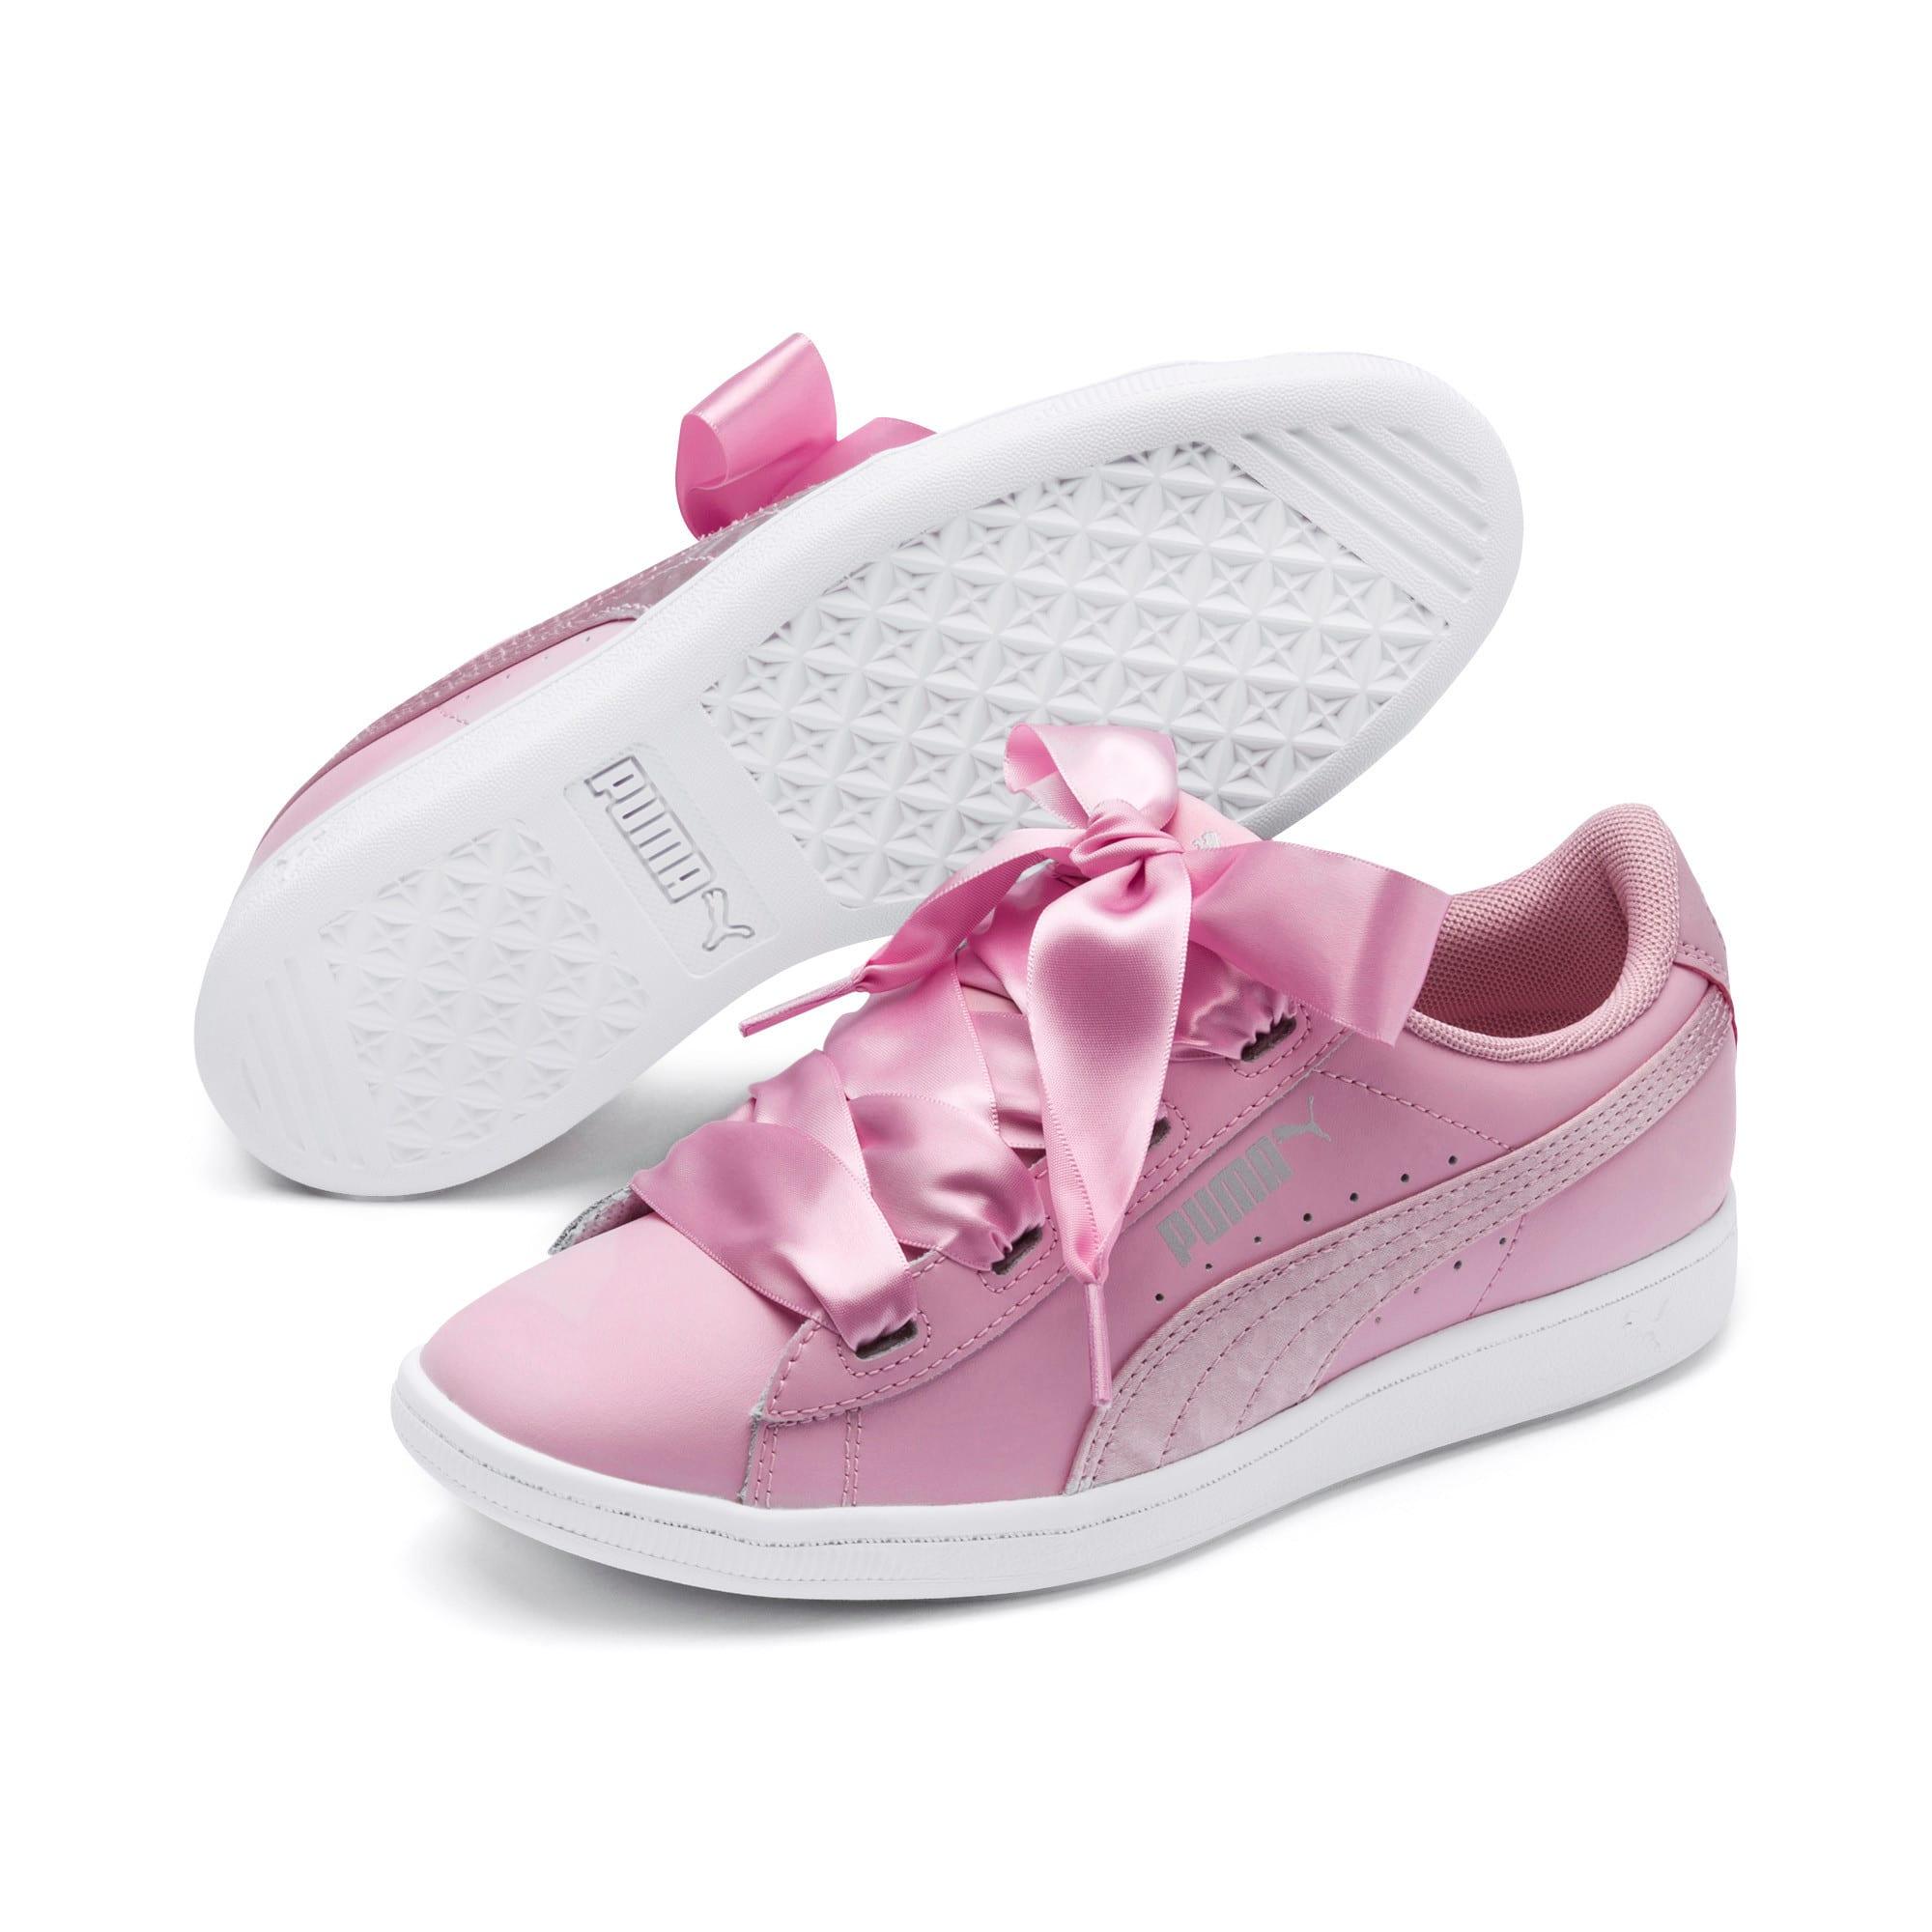 Thumbnail 2 of PUMA Vikky Ribbon Satin Sneakers JR, Pale Pink-Pale Pink, medium